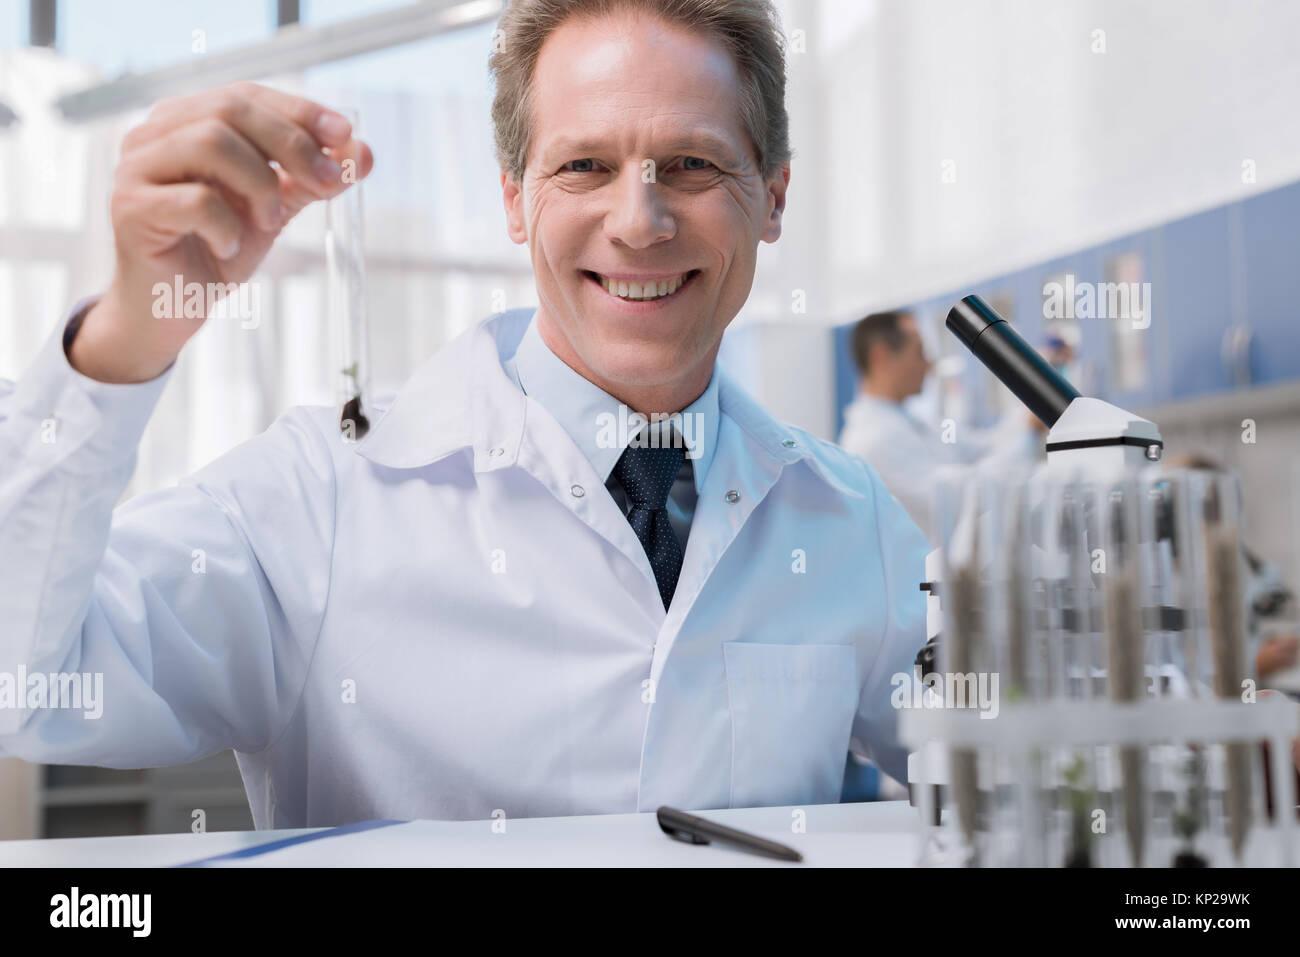 Smiling chemist holding test tube  - Stock Image